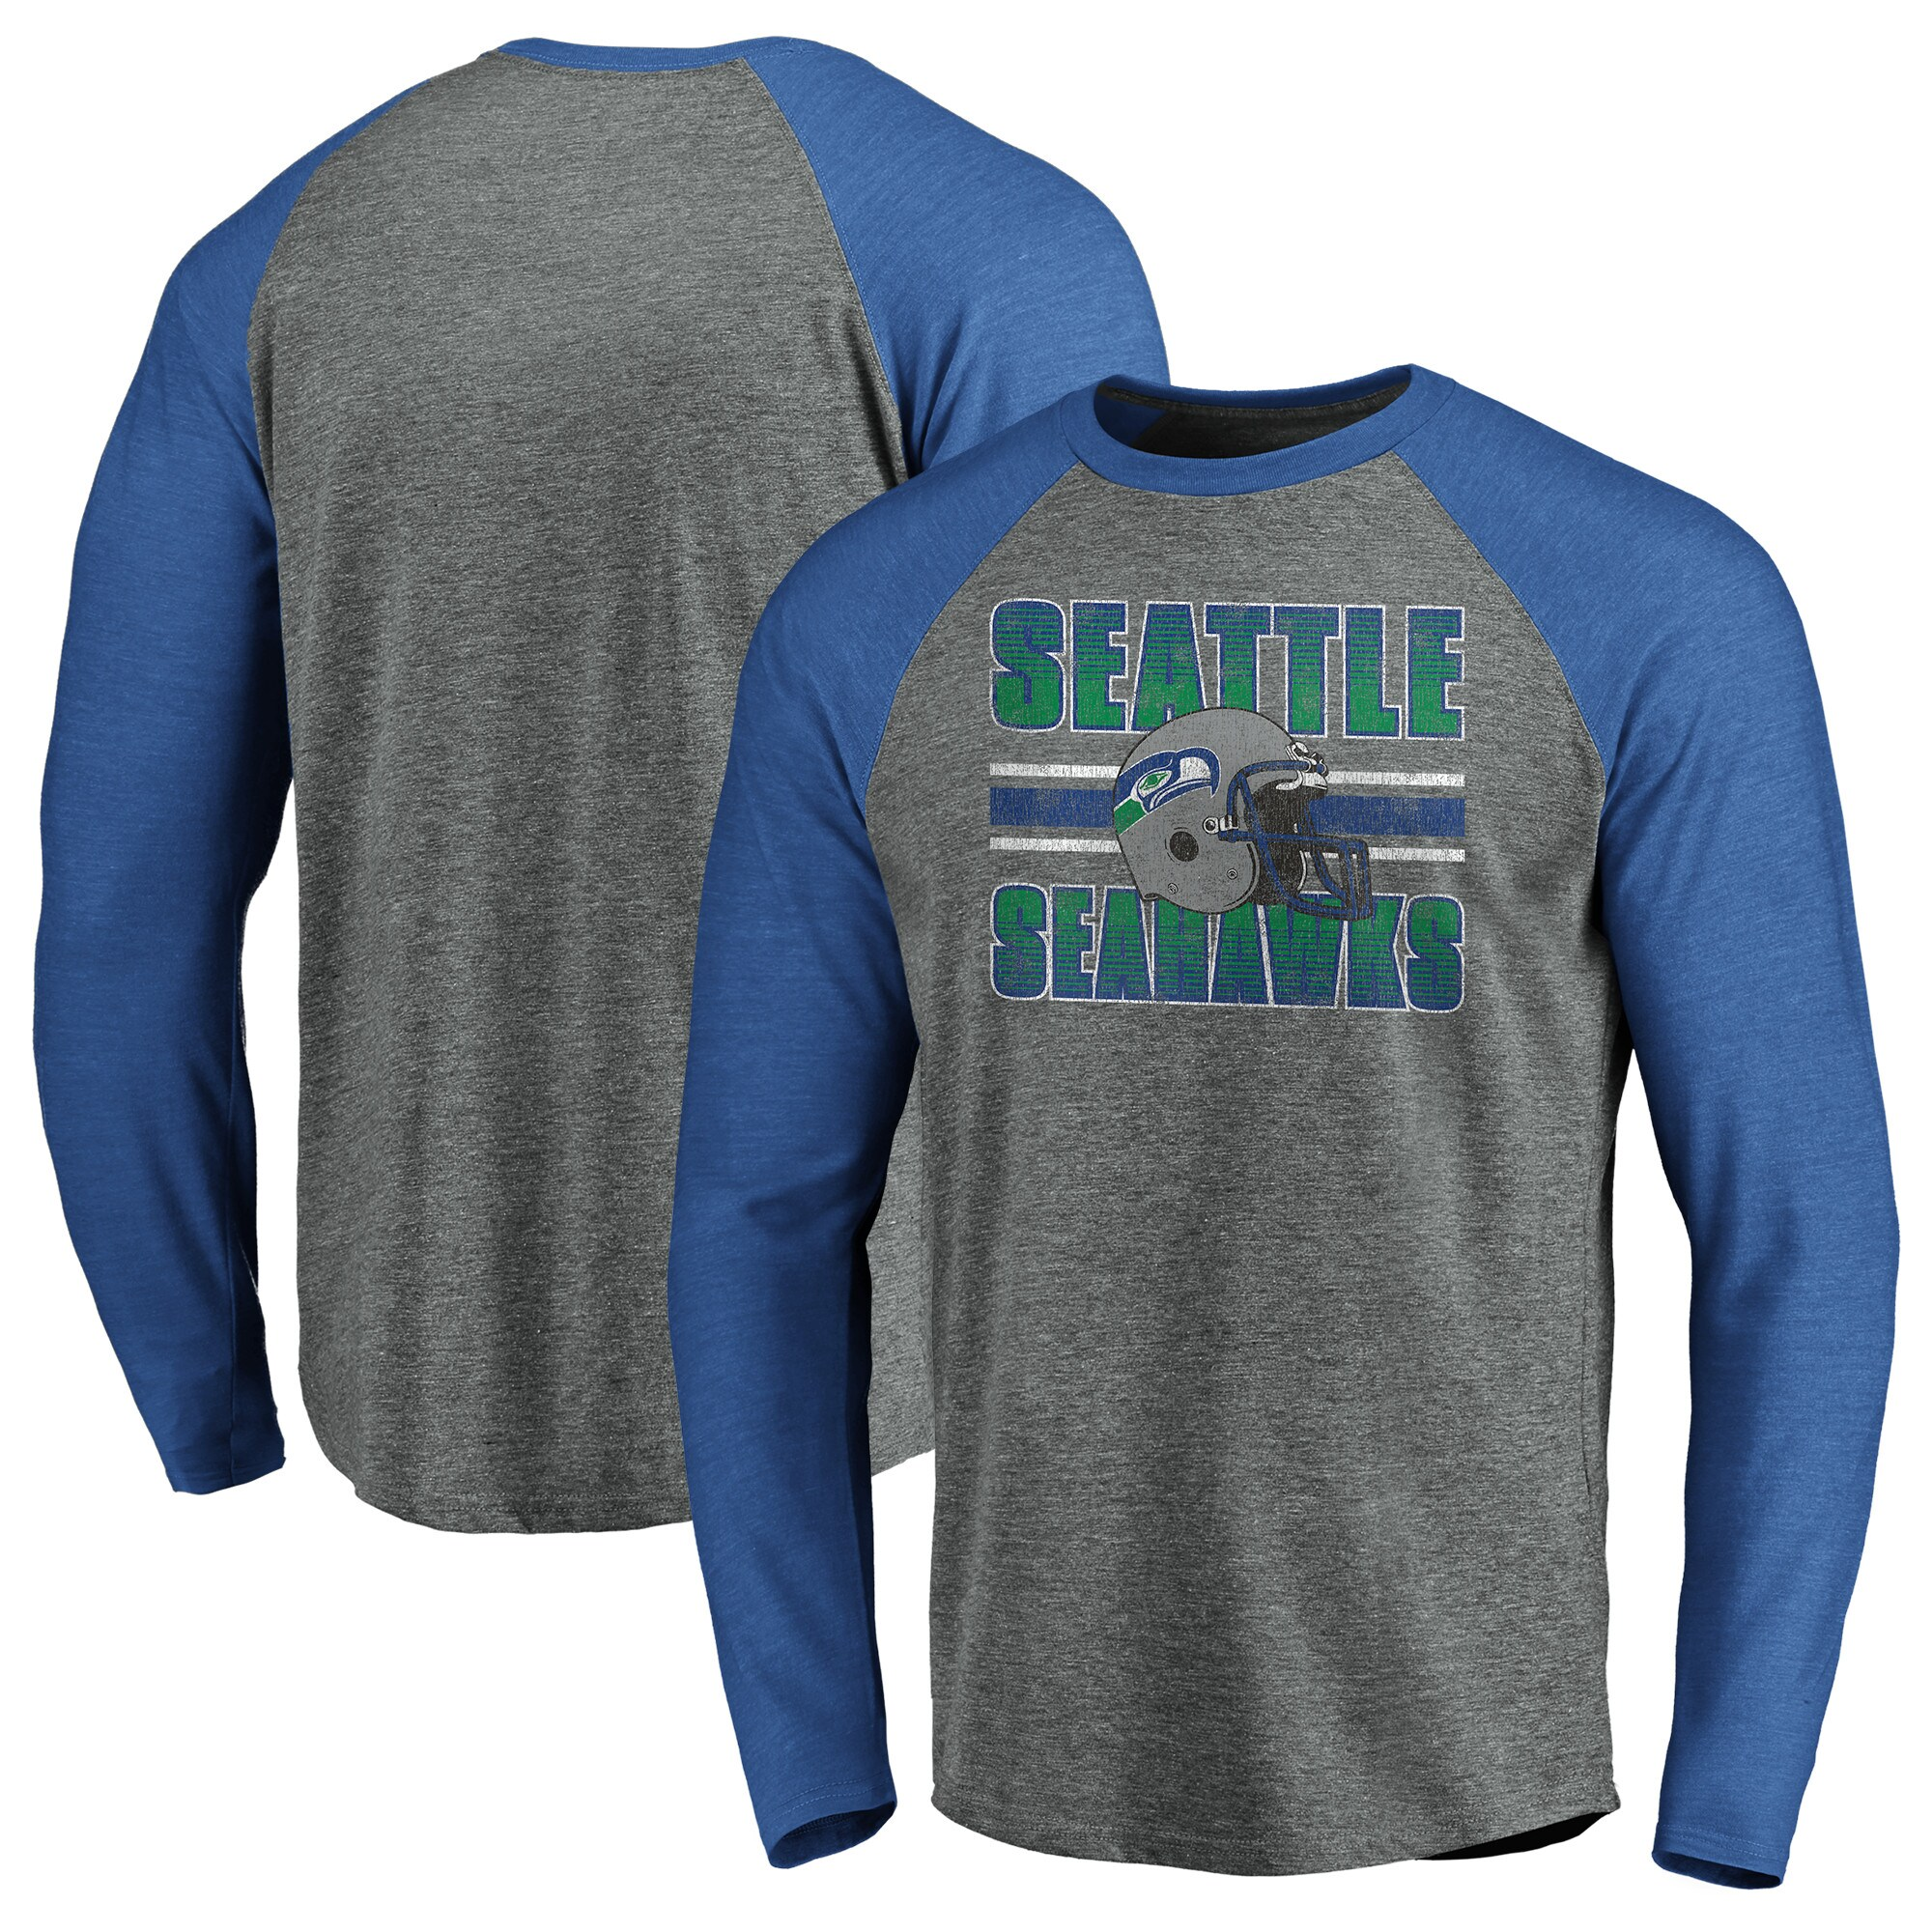 Seattle Seahawks NFL Pro Line by Fanatics Branded True Classics Stripe Helmet Throwback Tri-Blend Raglan Long Sleeve T-Shirt - Gray/Heathered Royal